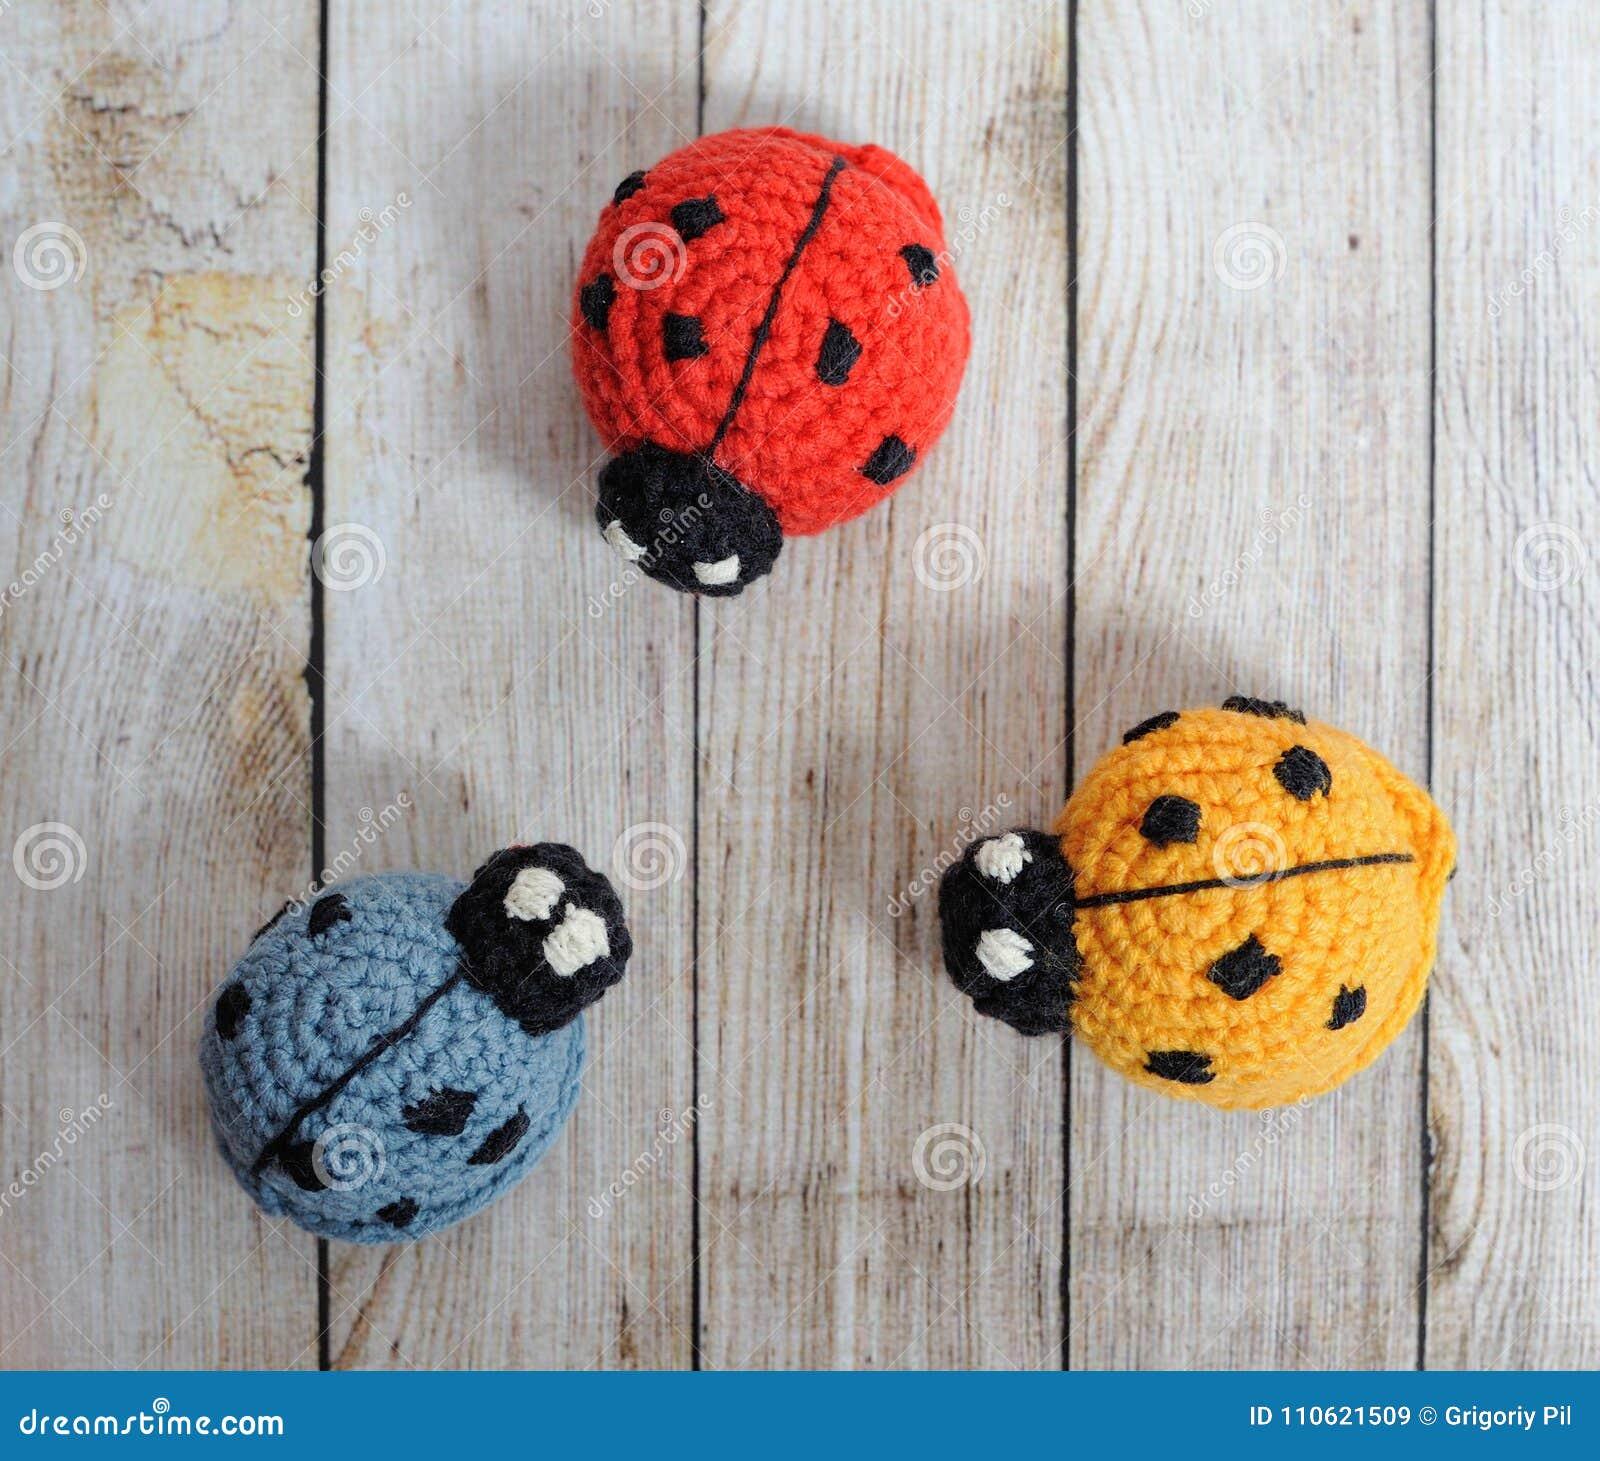 Amigurumi cuties | Crochet bunny, puppy and teddy | lilleliis | 1204x1300